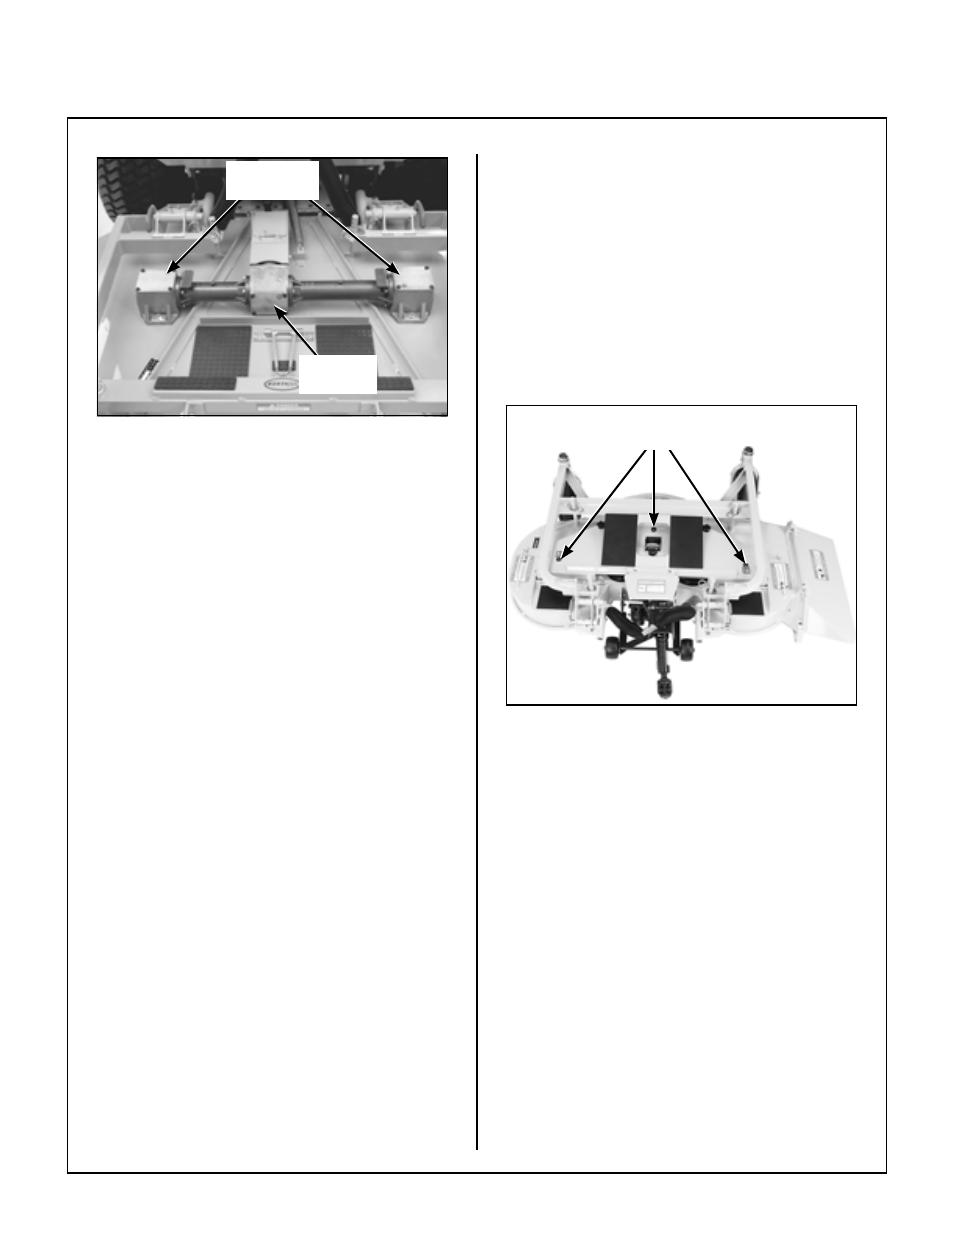 dsd52 mower deck lubrication blade spindle lubrication maintenance rh manualsdir com hp 49 calculator manual hp48 manual pdf